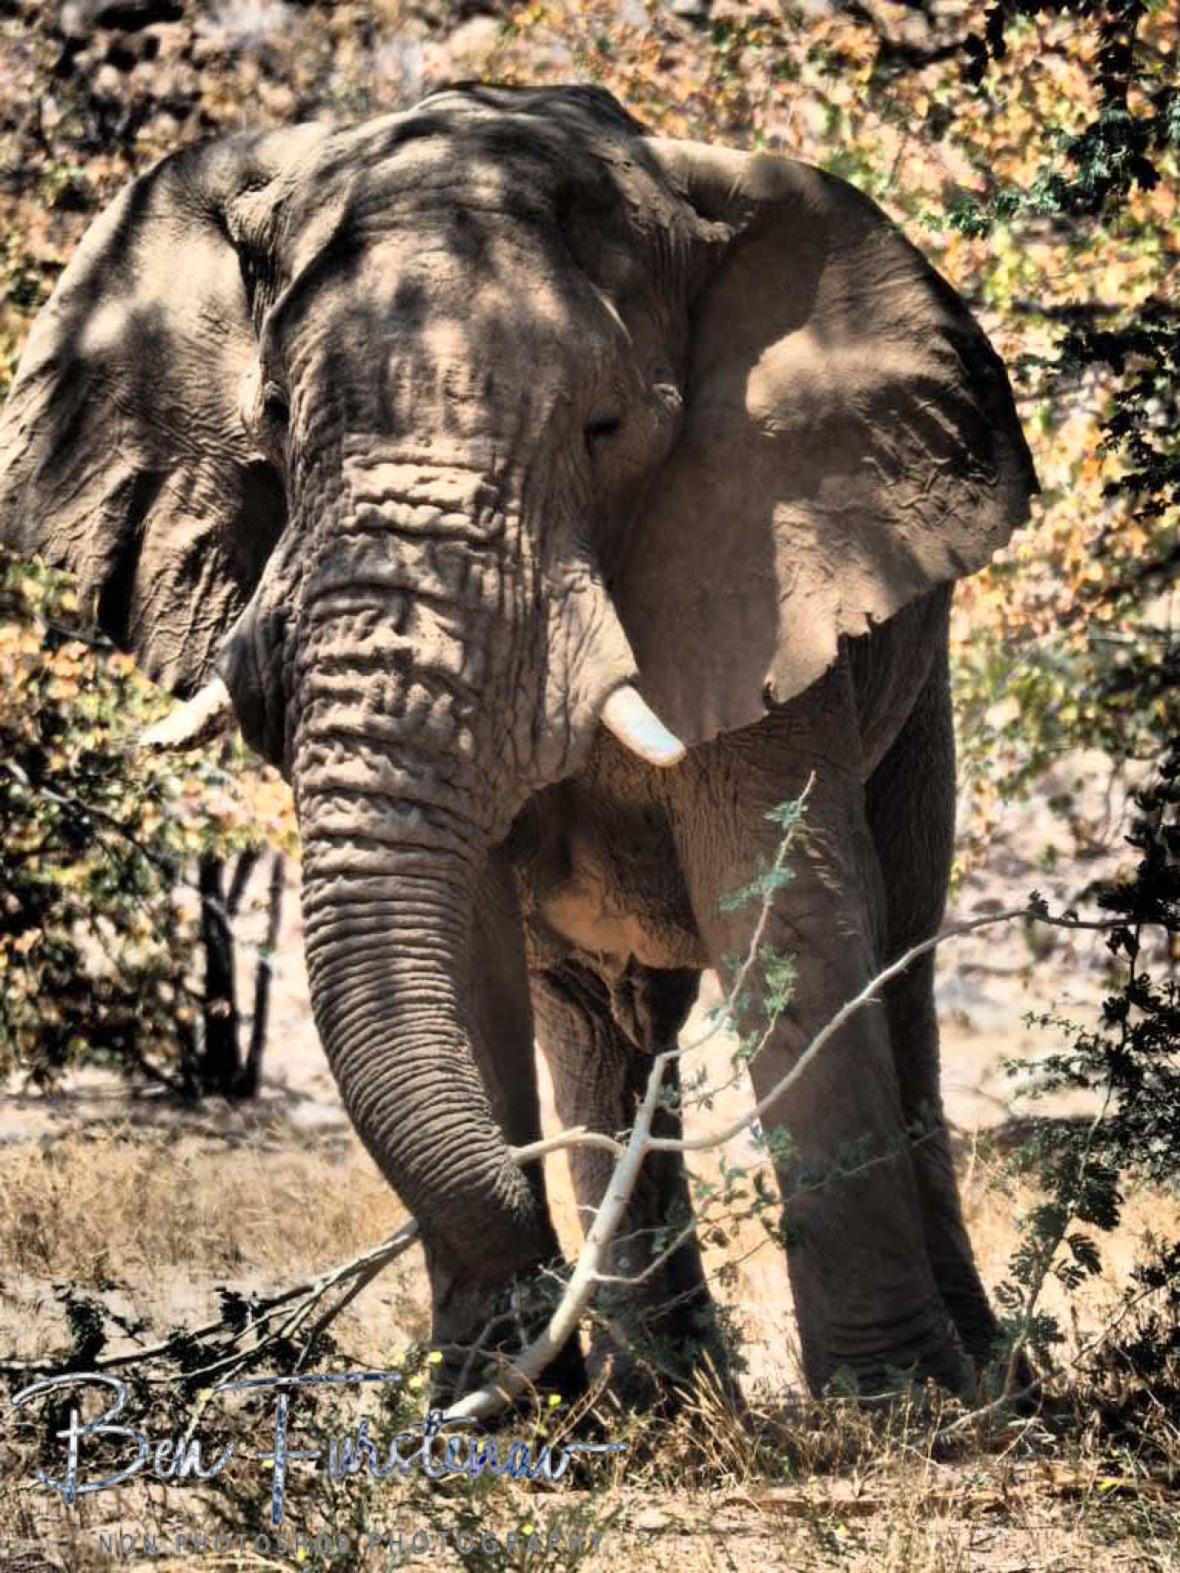 Stumpy in appearance, Damaraland, Namibia